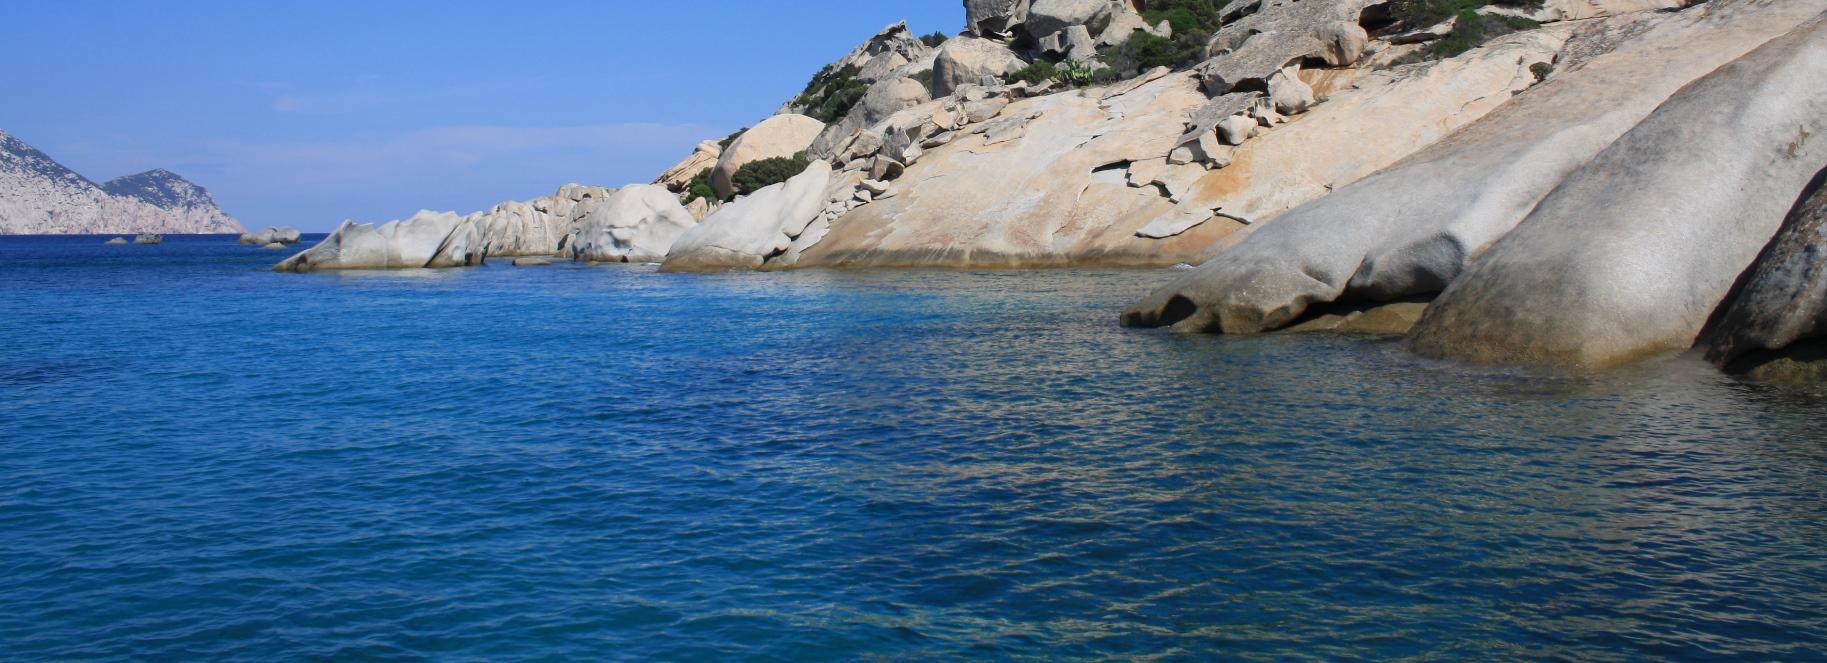 Golfo Aranci  Sardegna - Italia